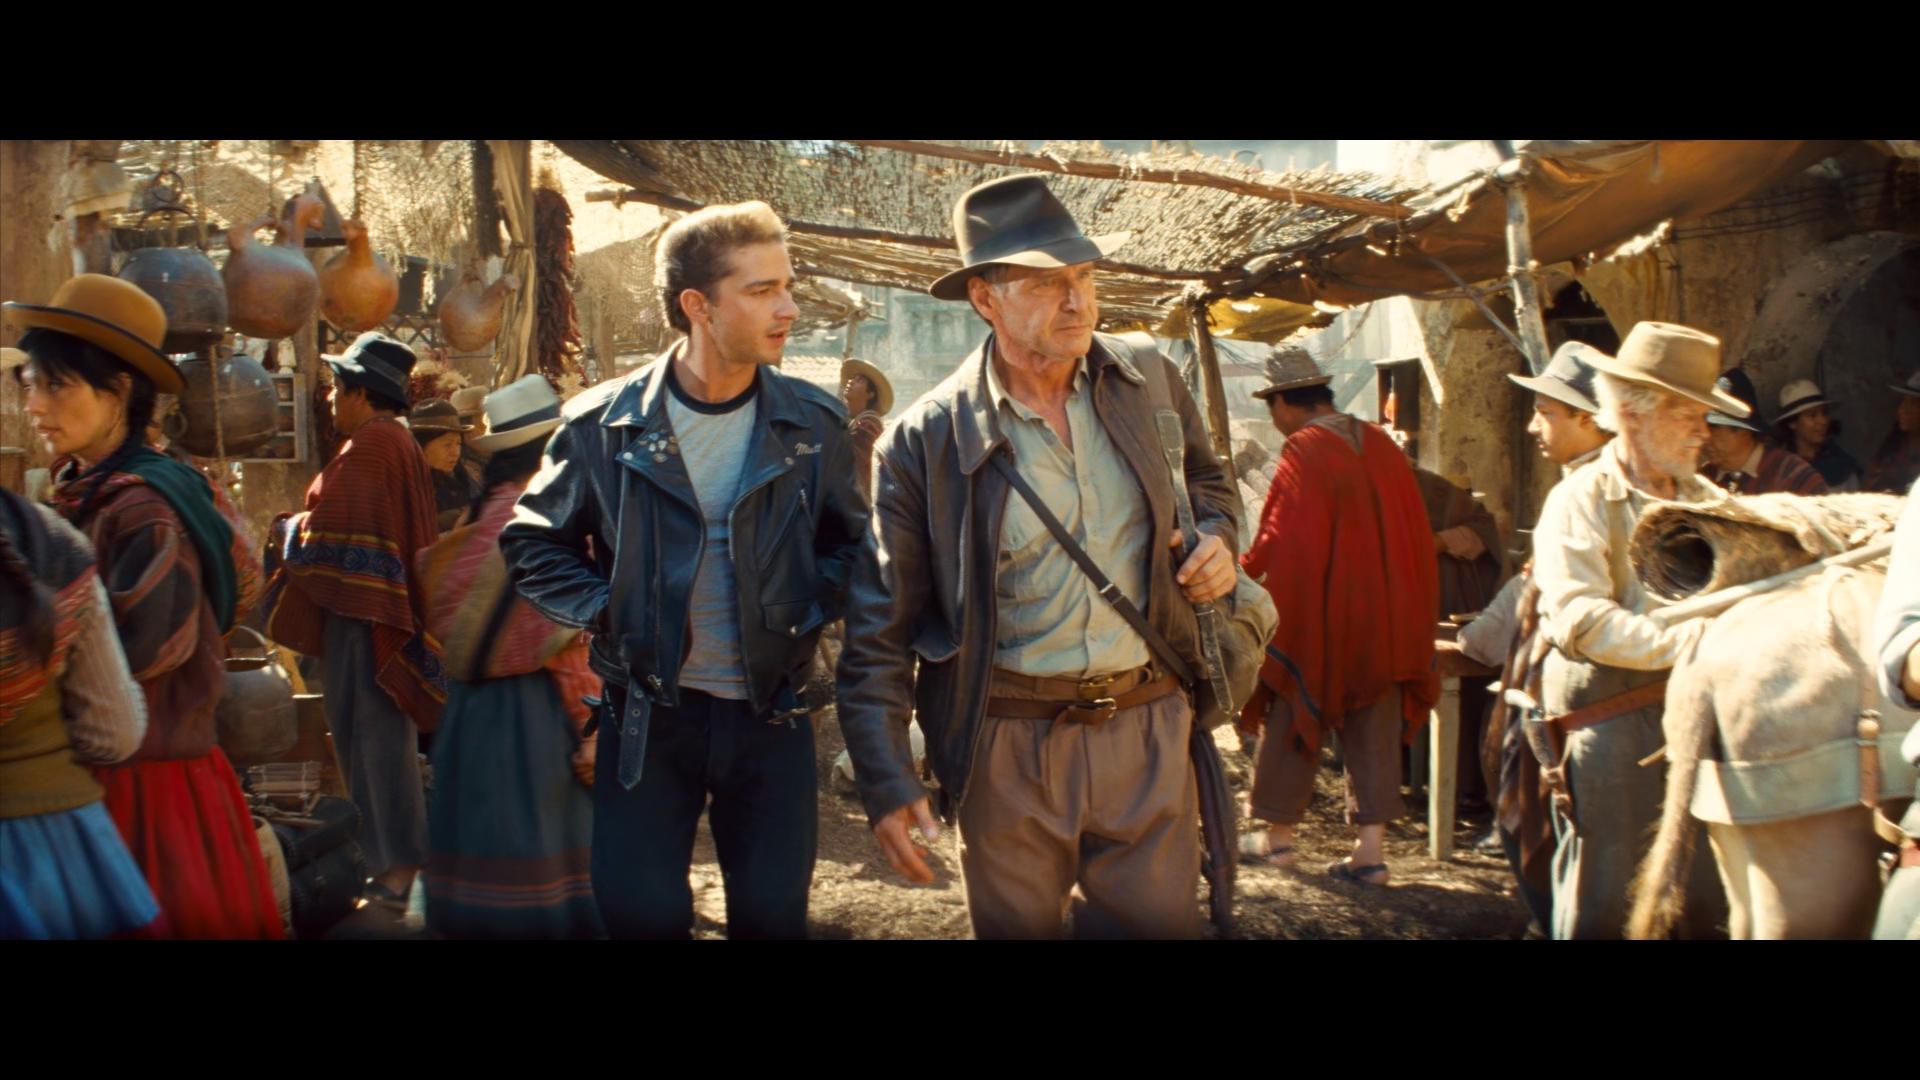 Indiana Jones And The Kingdom Of The Crystal Skull 2008 1080p Blu Ray 10bit X265 Dts Dr3ad Lo X Mkv Imgbb